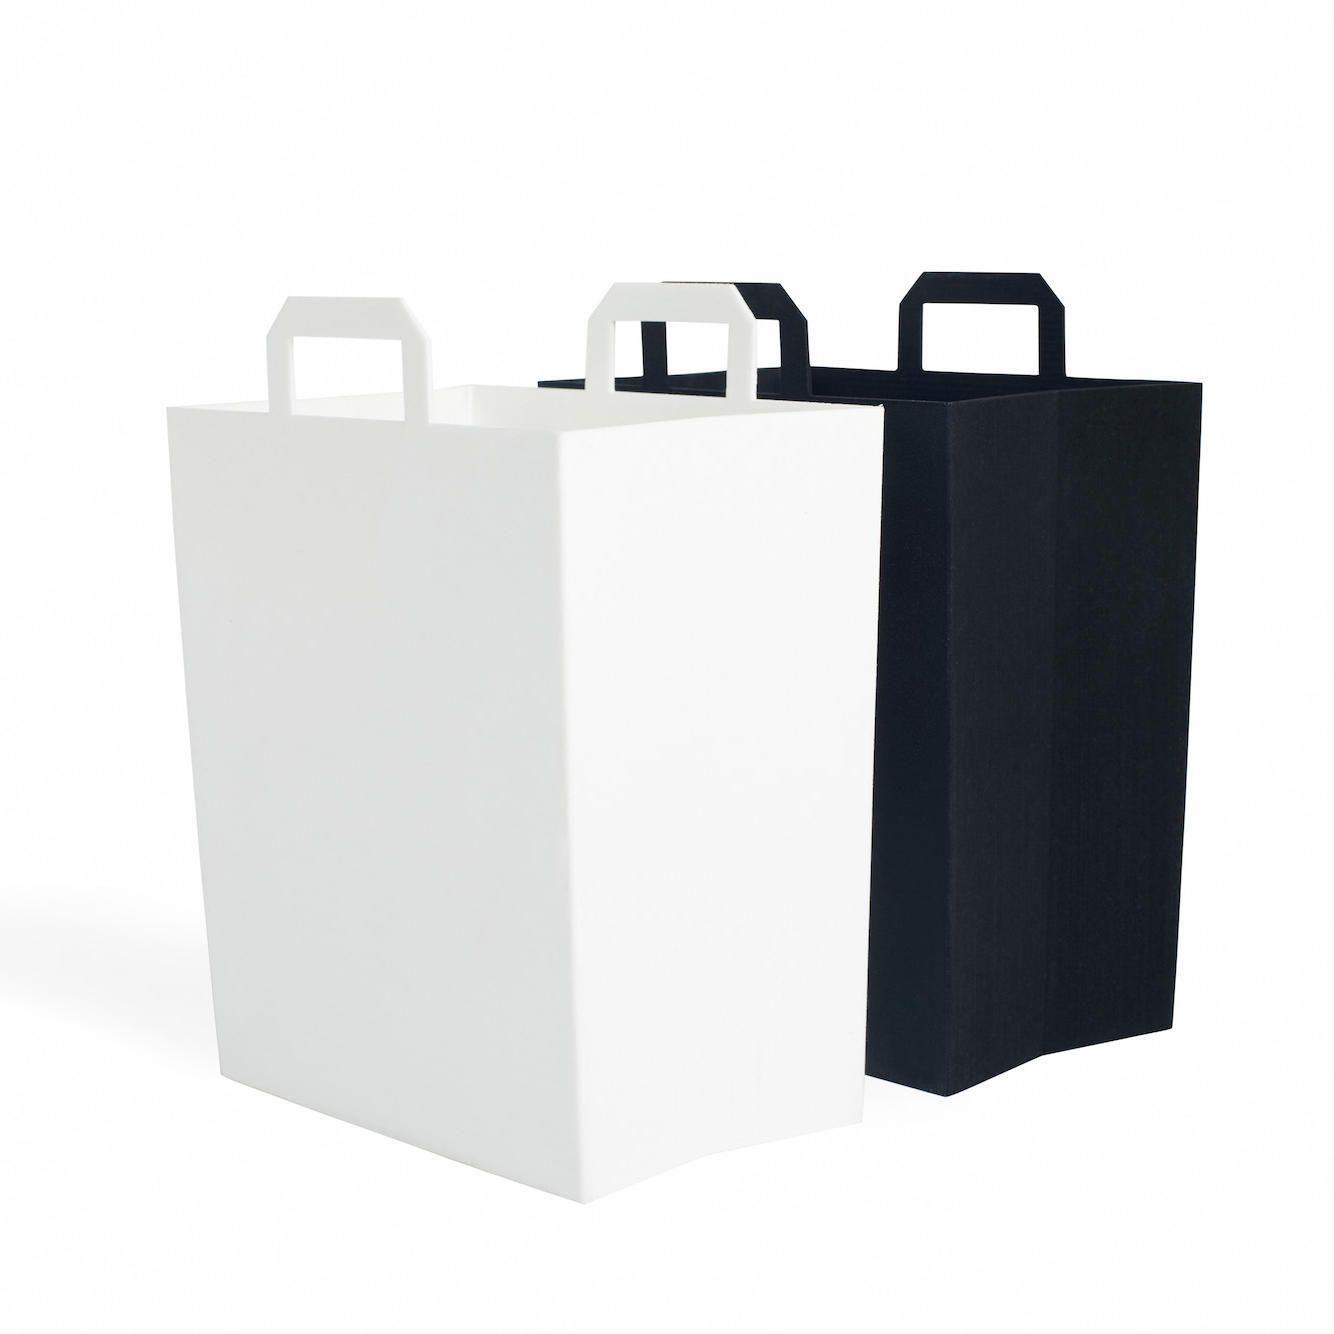 Modern Recycling Bin Set